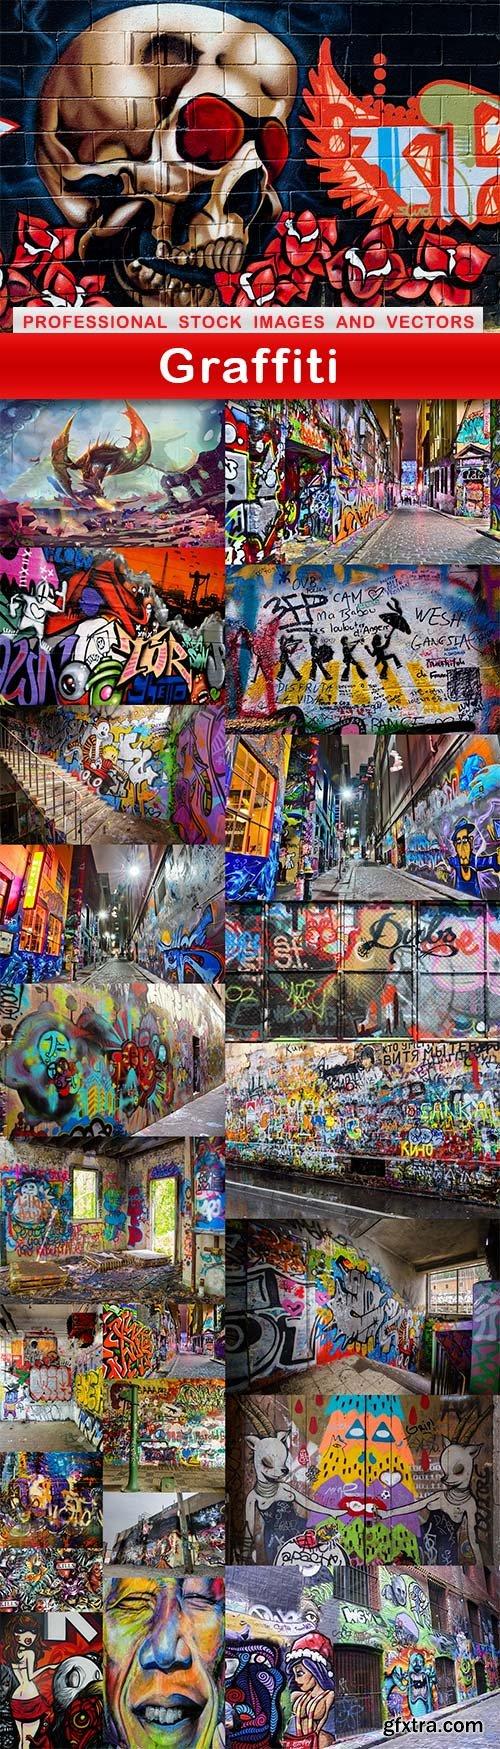 Graffiti - 23 UHQ JPEG